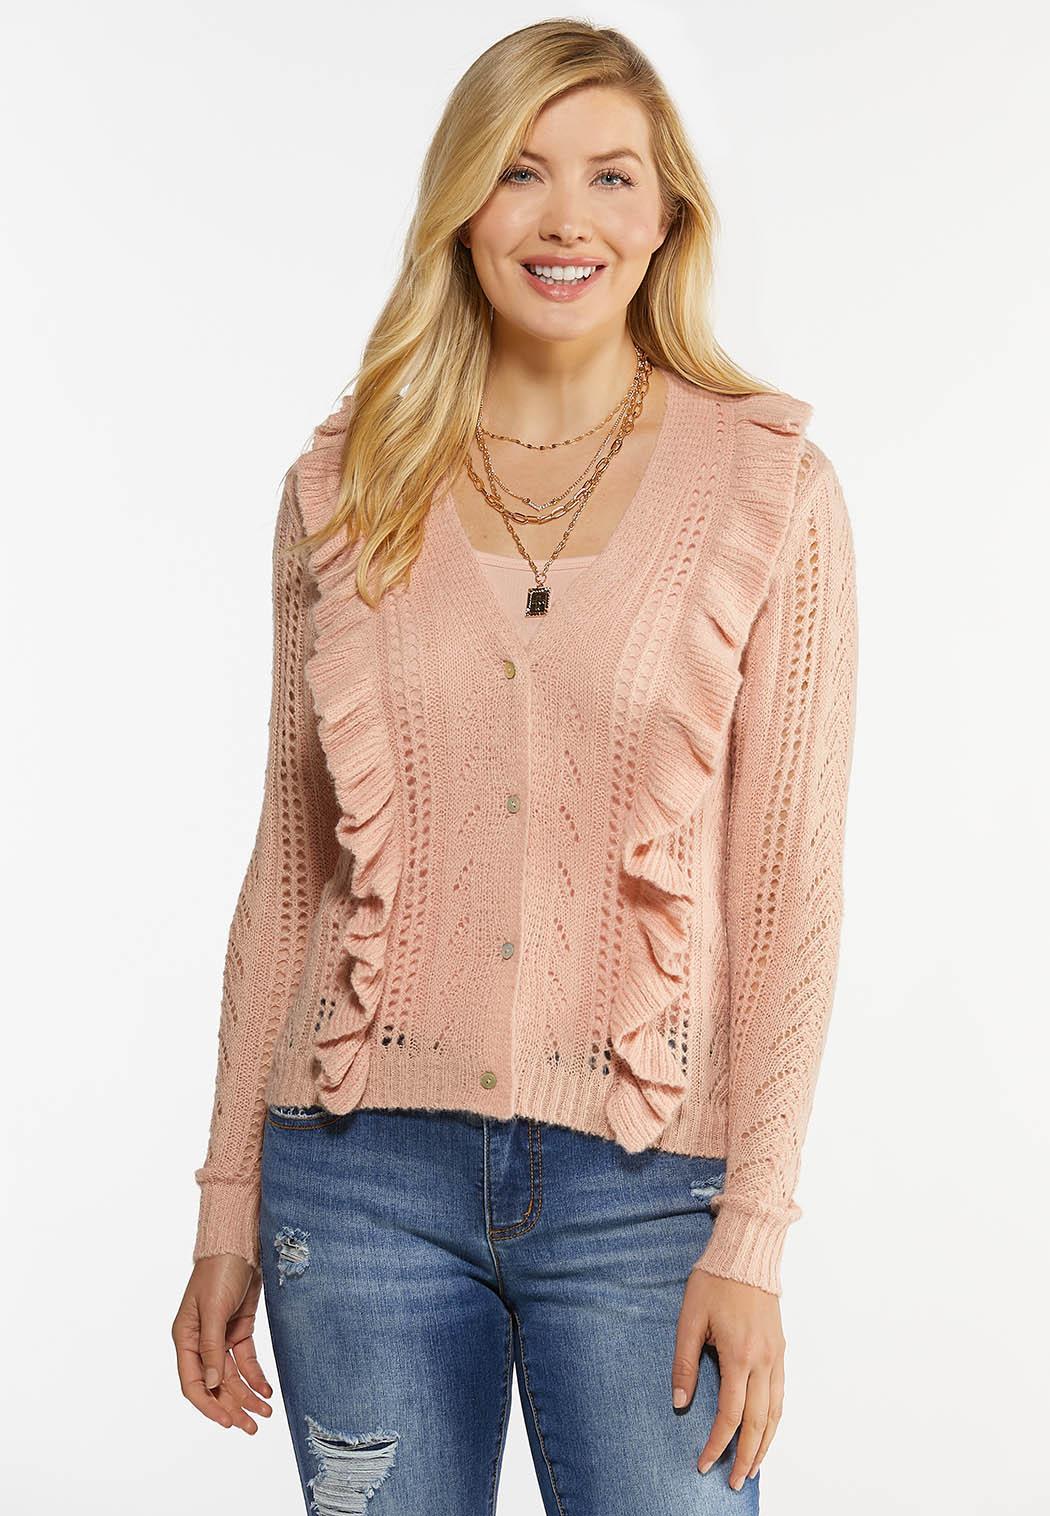 Ruffled Stitch Cardigan Sweater